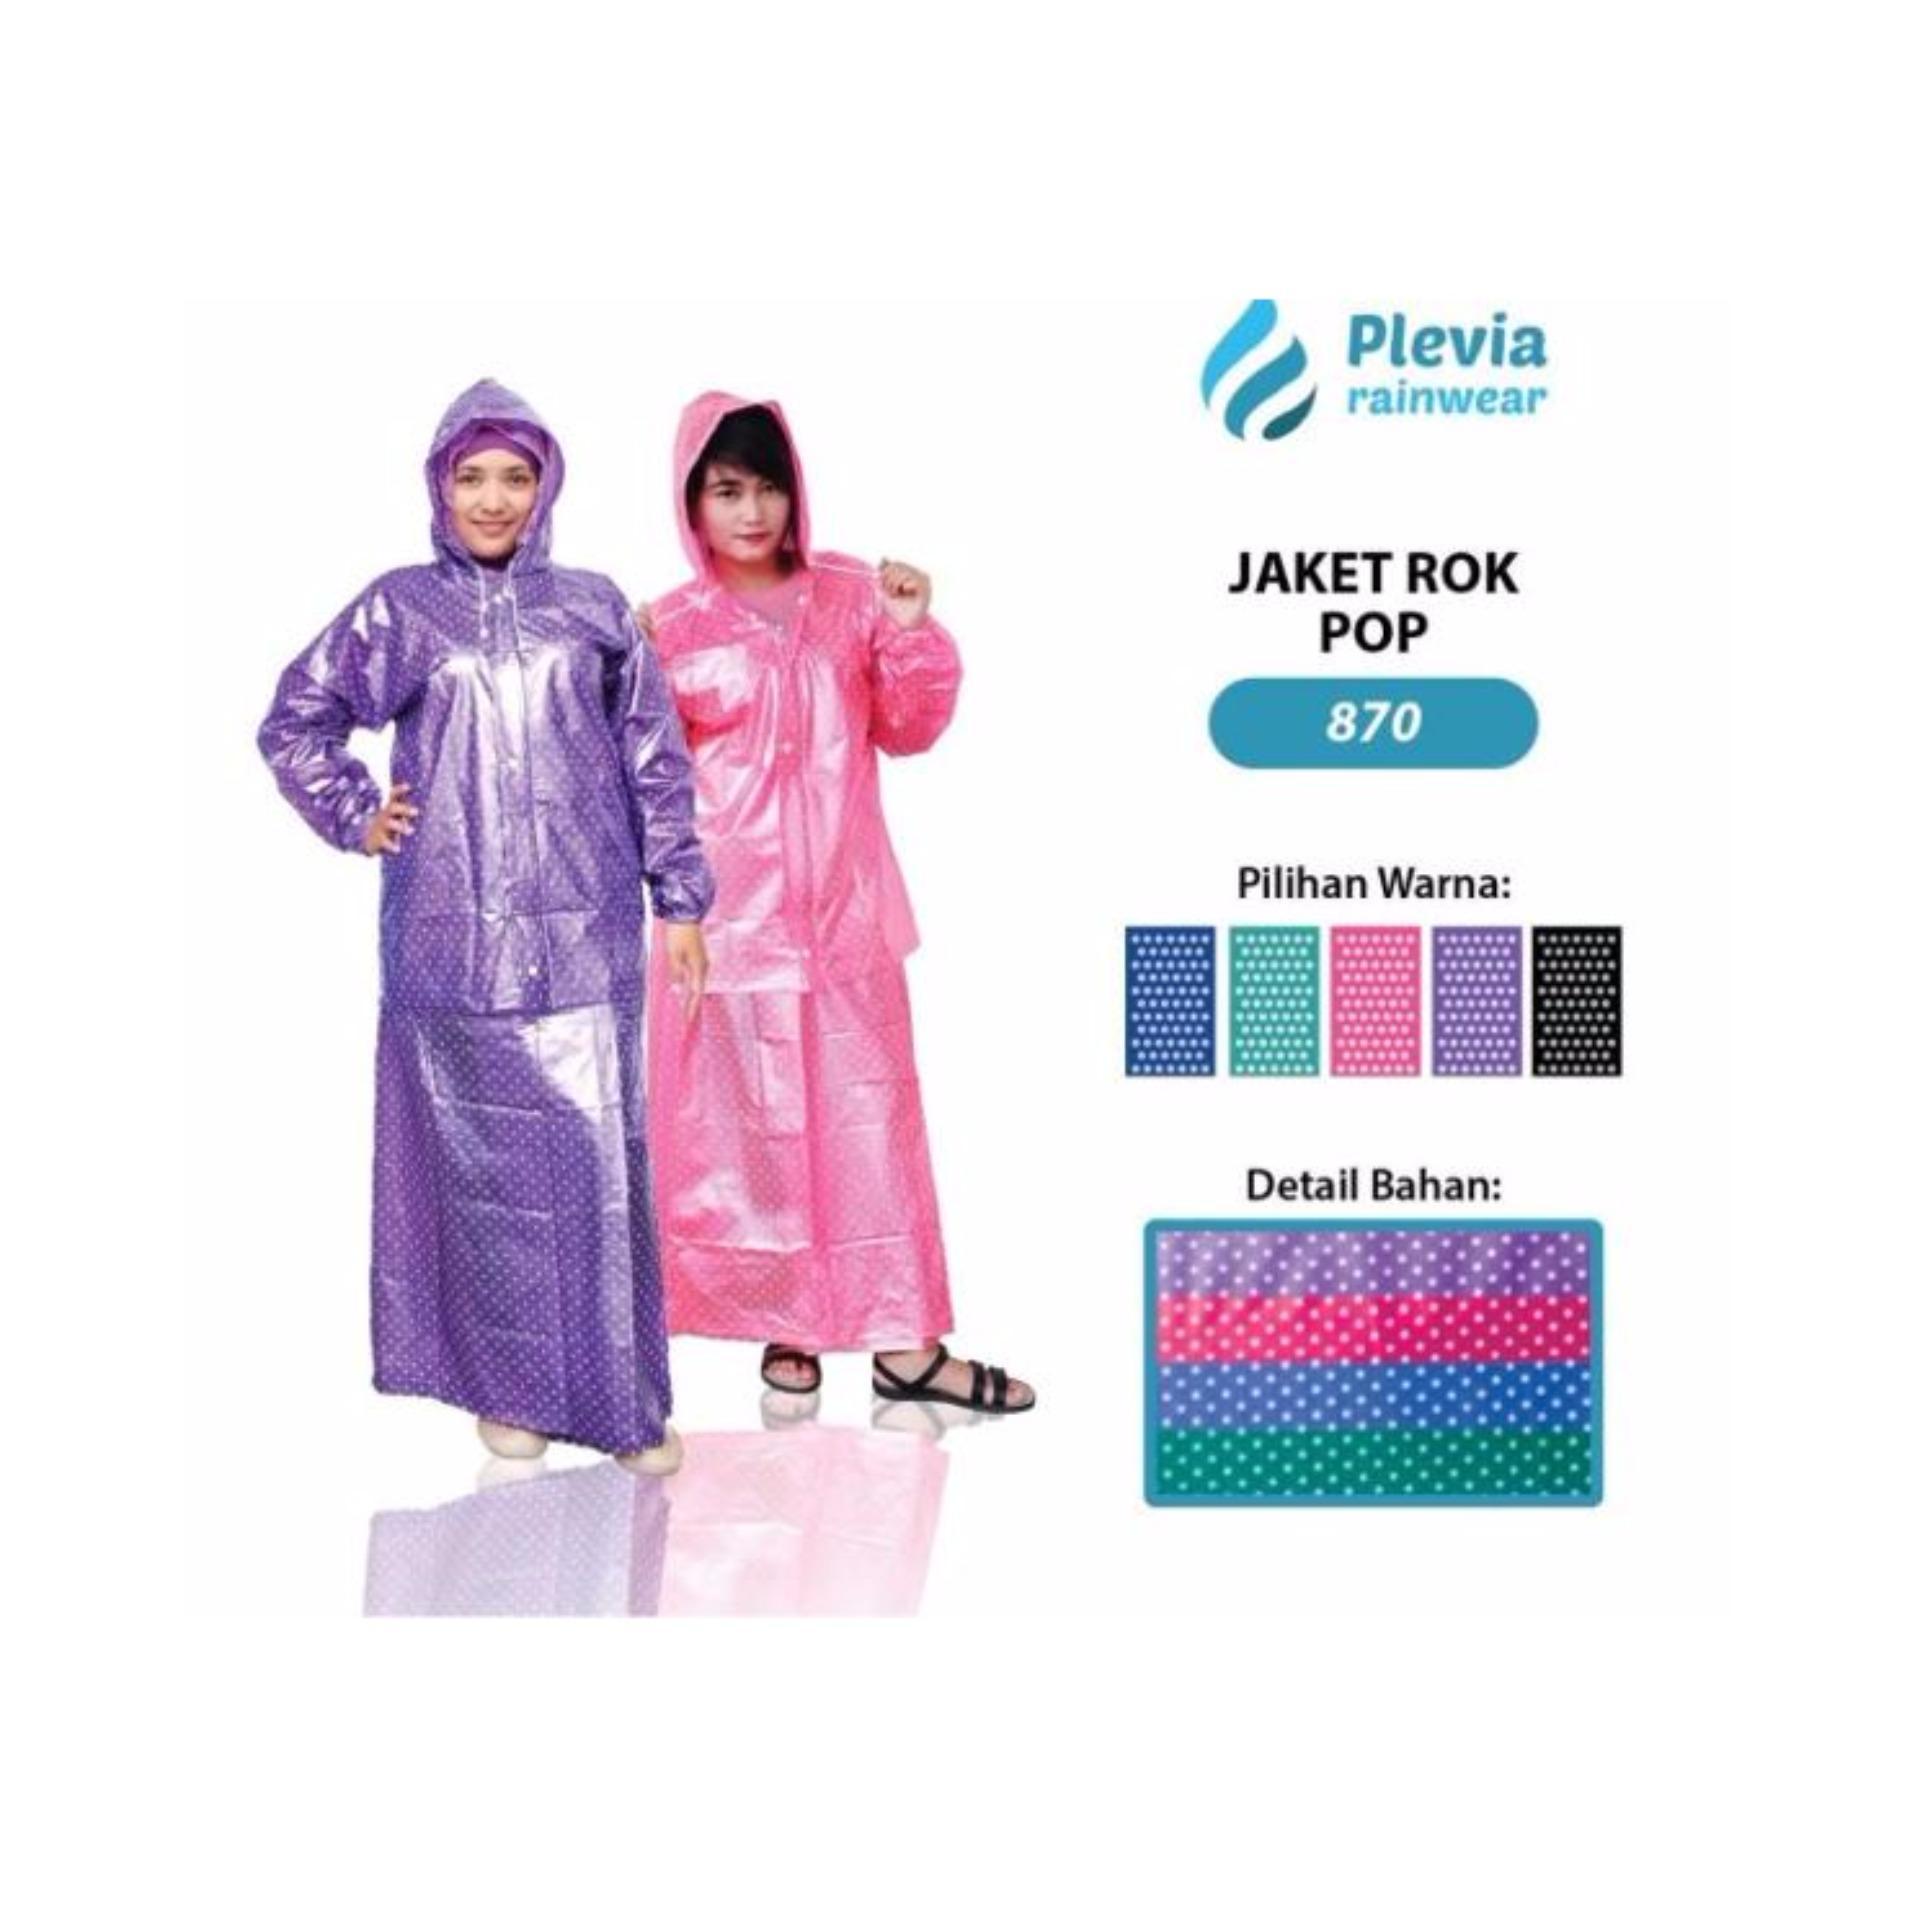 Promo Jas Hujan Jaket Rok Plevia Pop 870 Maroon